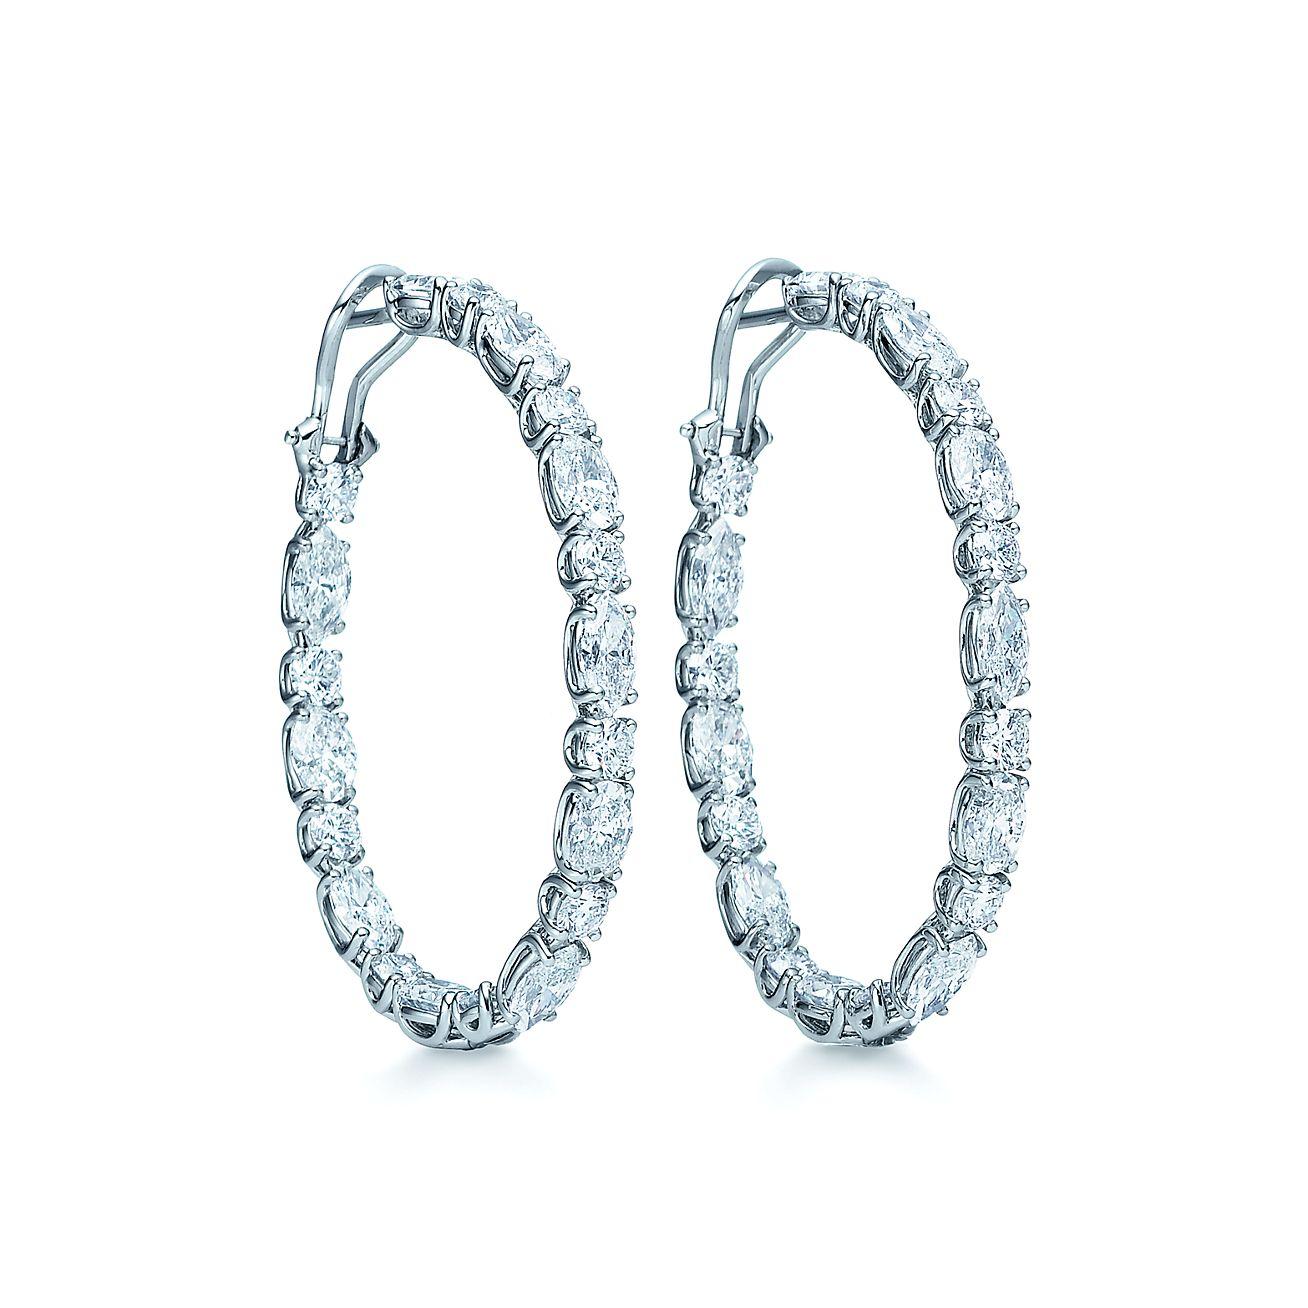 tiffany and co earrings 925 hot girls wallpaper